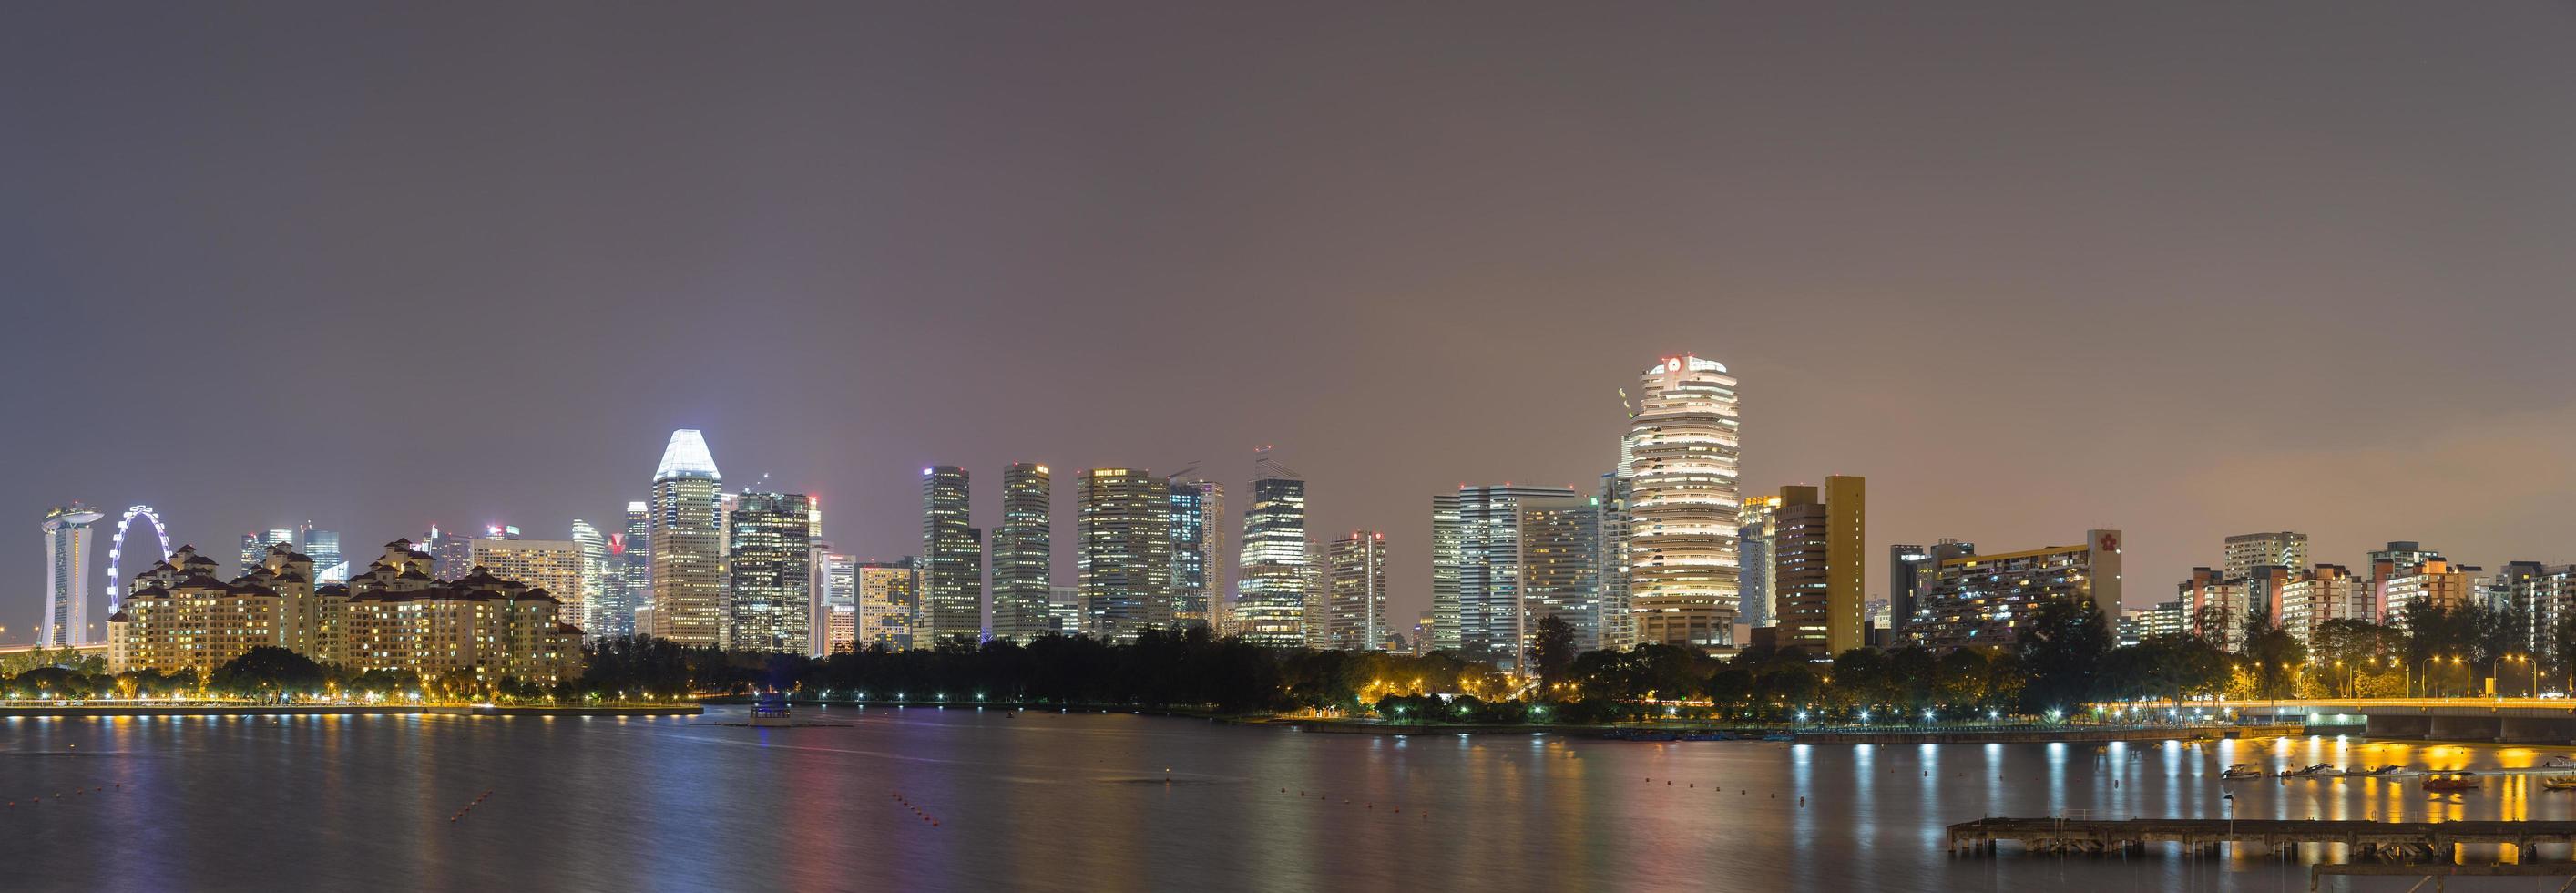 skyline van singapore foto